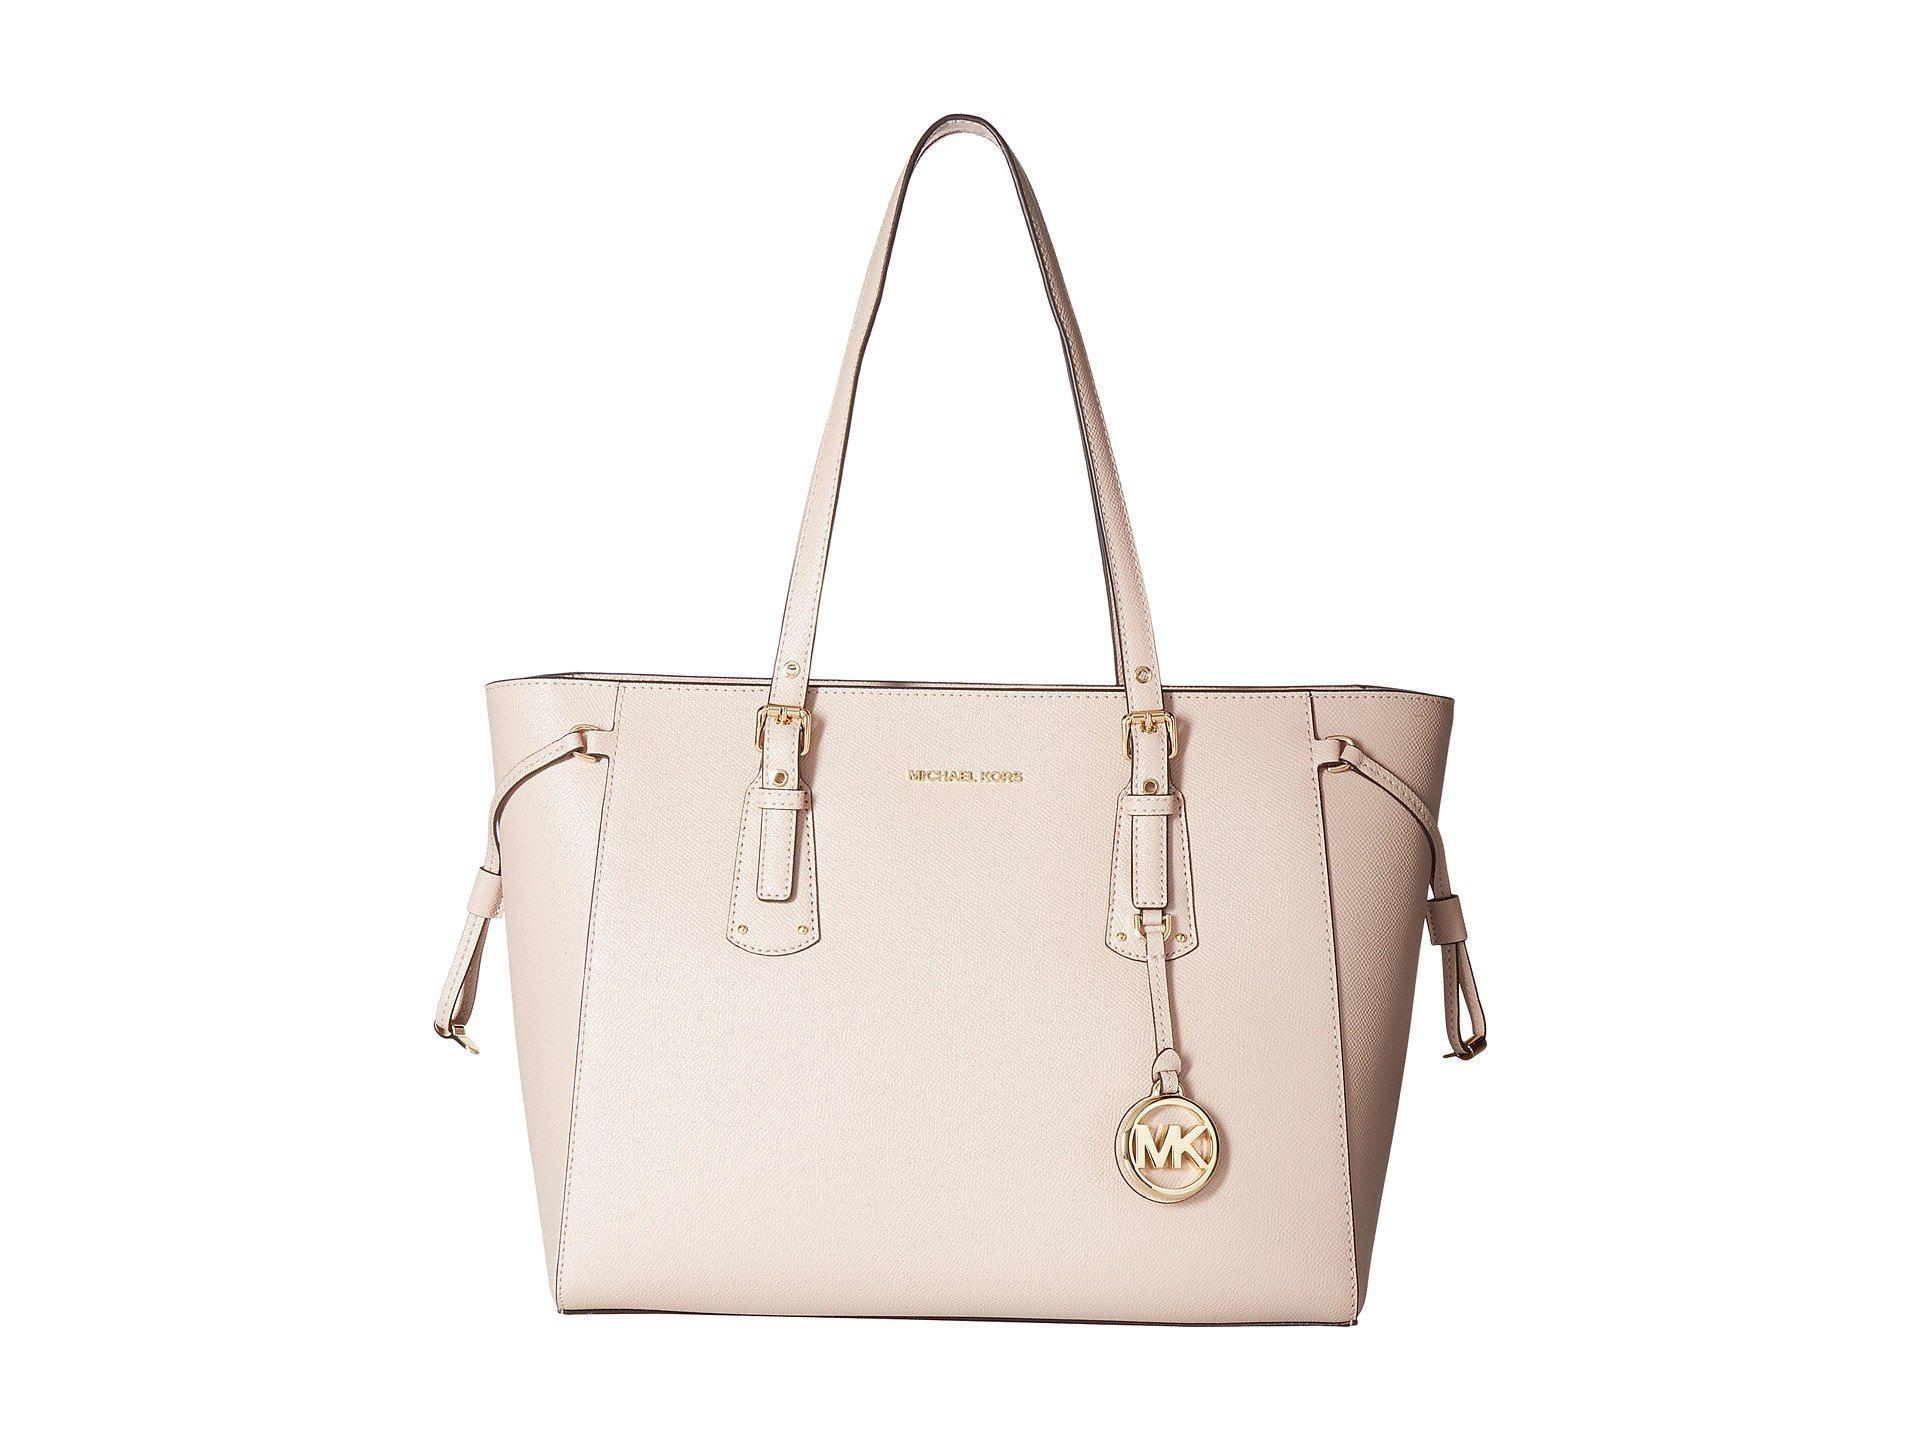 0c2e3ef746cc Lyst - MICHAEL Michael Kors Voyager Medium Tote Bag in Pink - Save 23%